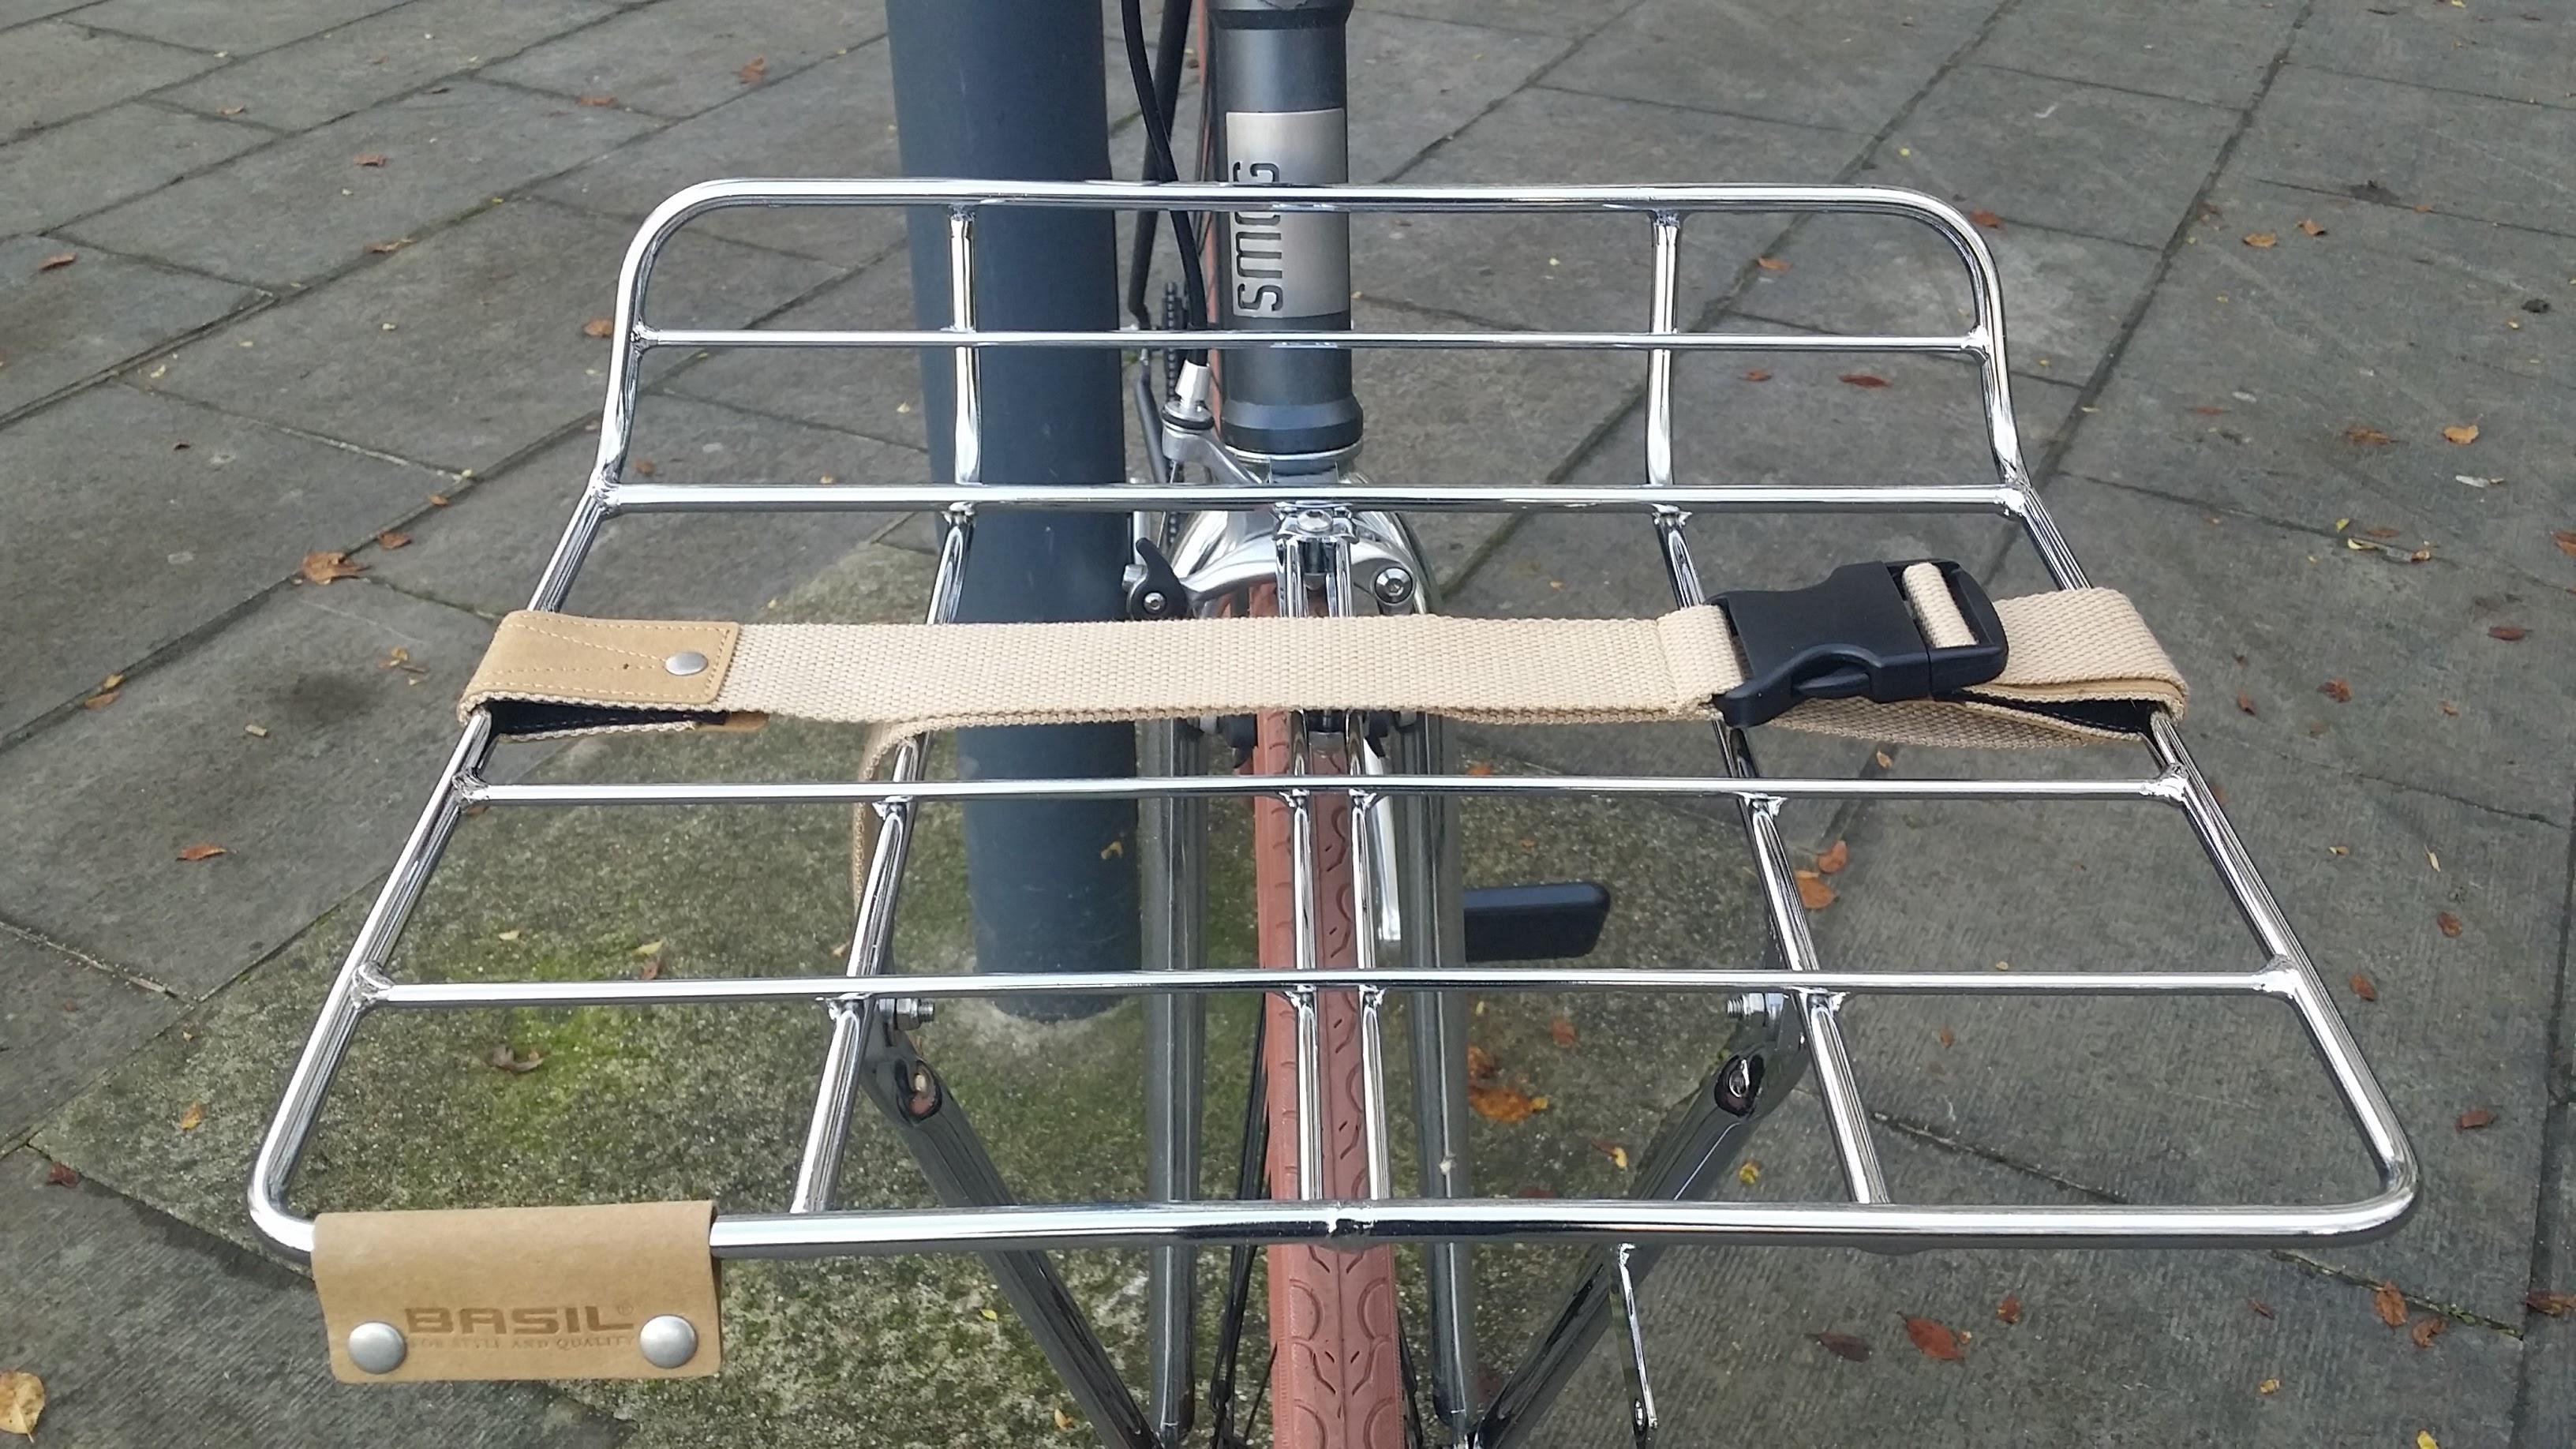 Porte-bagage Portland Basil avant sans rebord